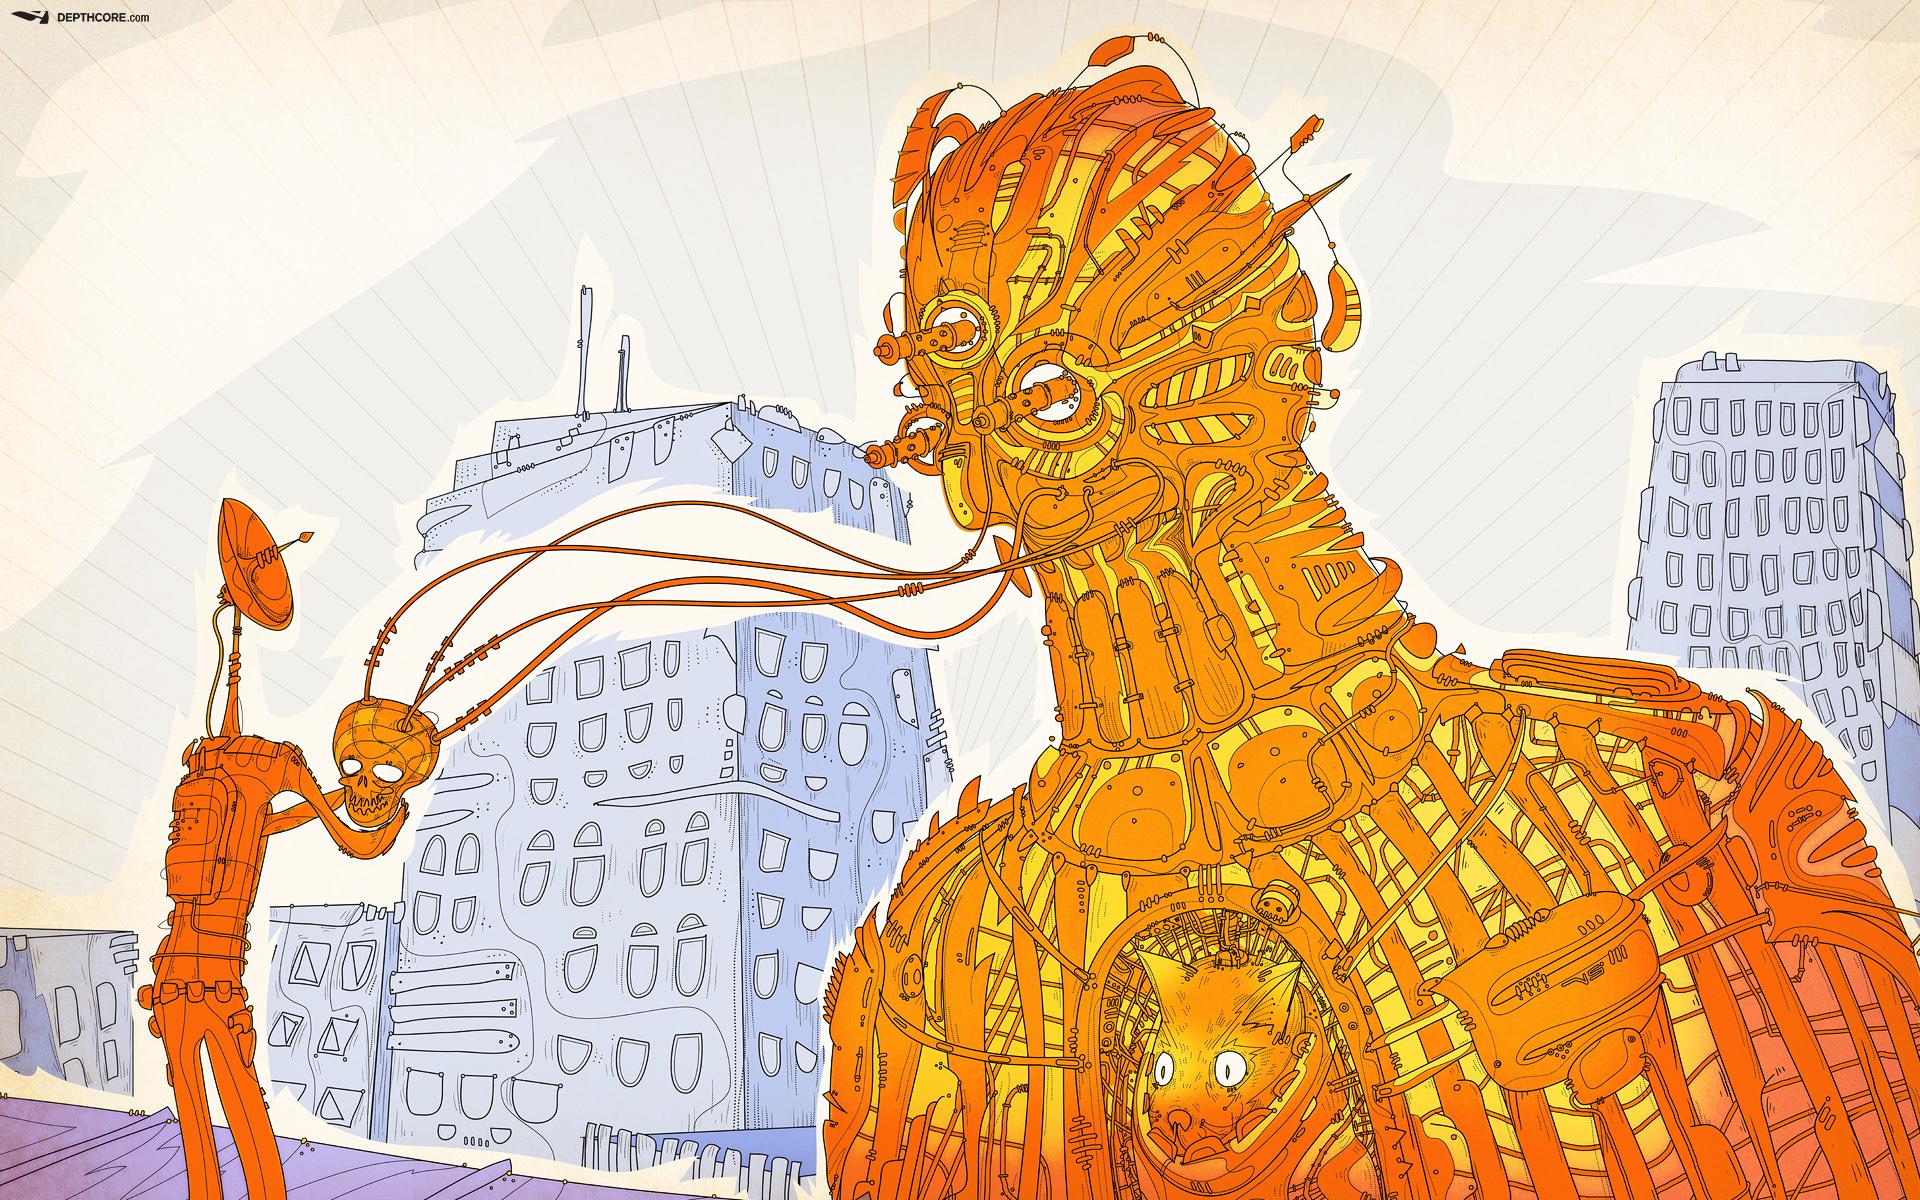 Retro Robot Wallpaper Backgrounds 1920x1200